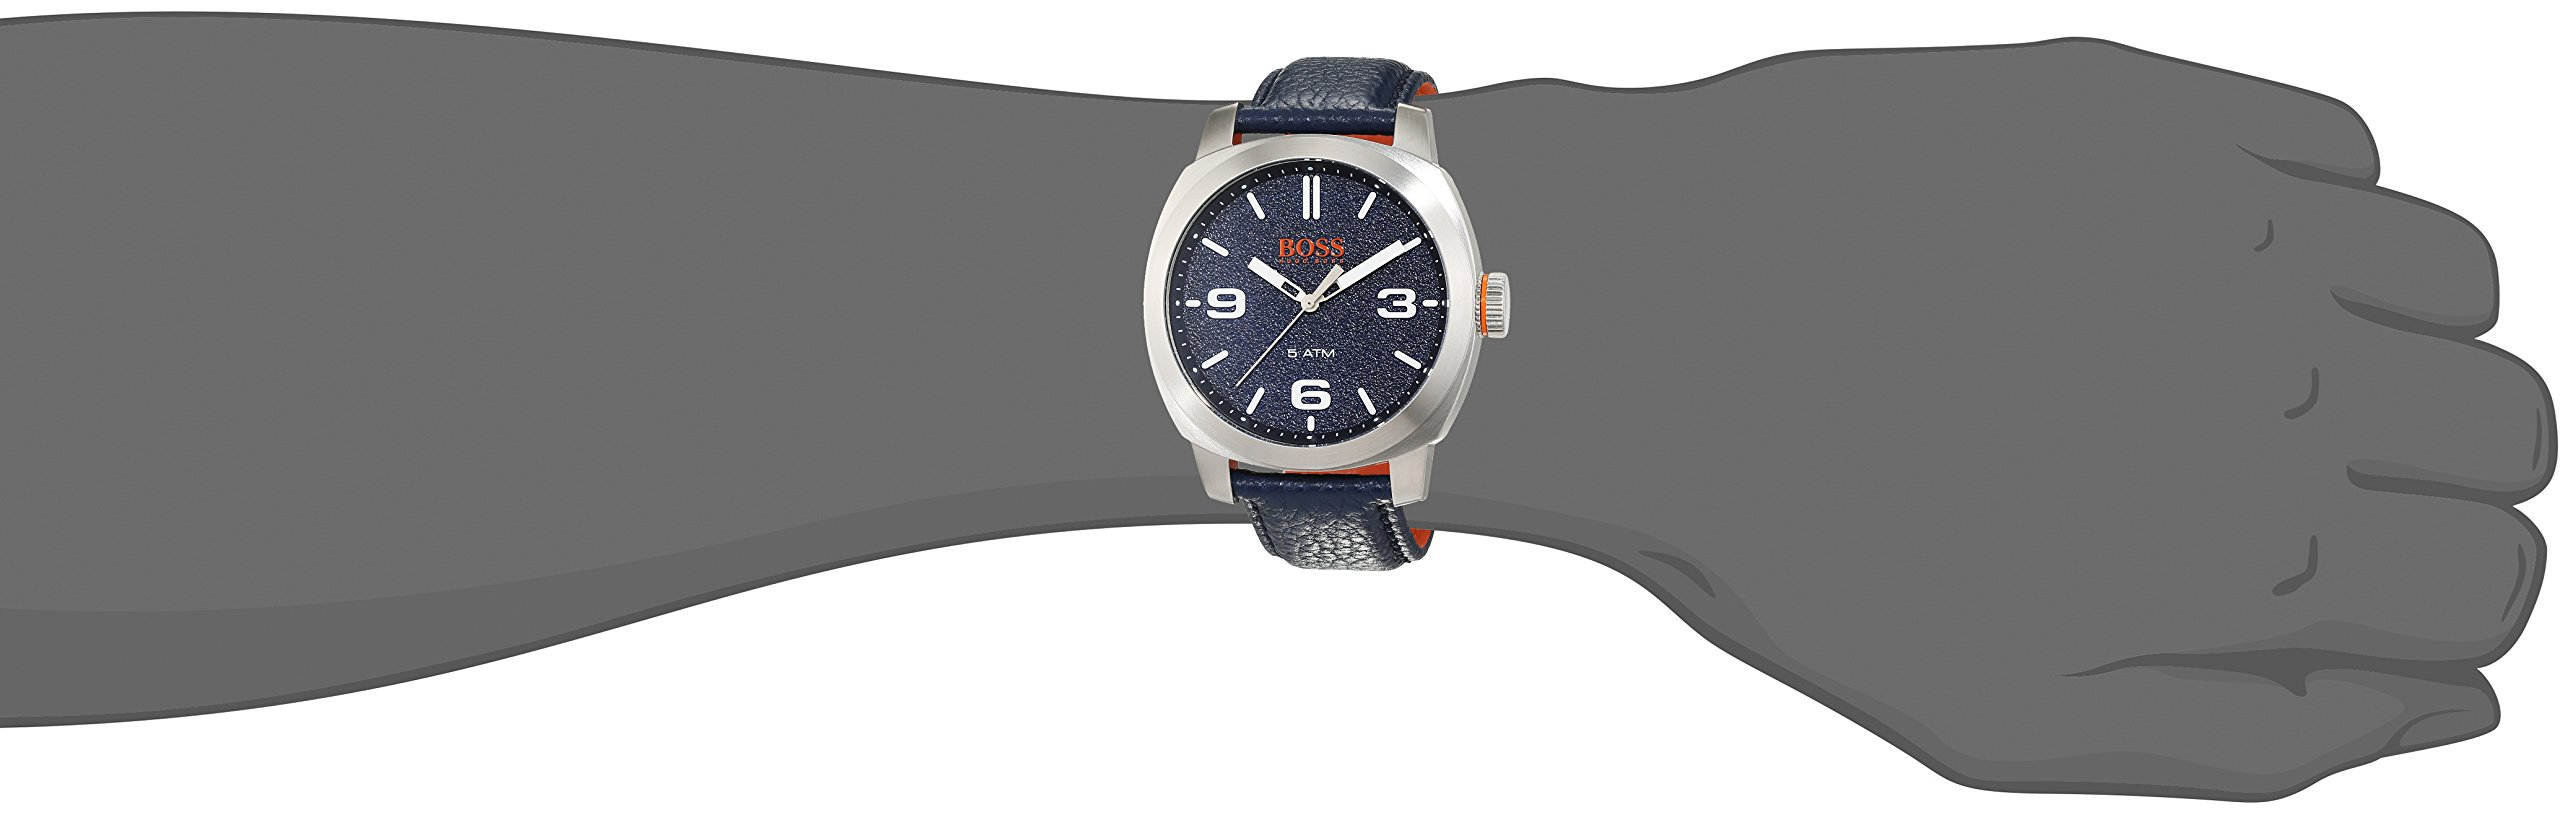 619jPlyfxhL - Hugo Boss Orange - Reloj de pulsera para hombre - 1513410